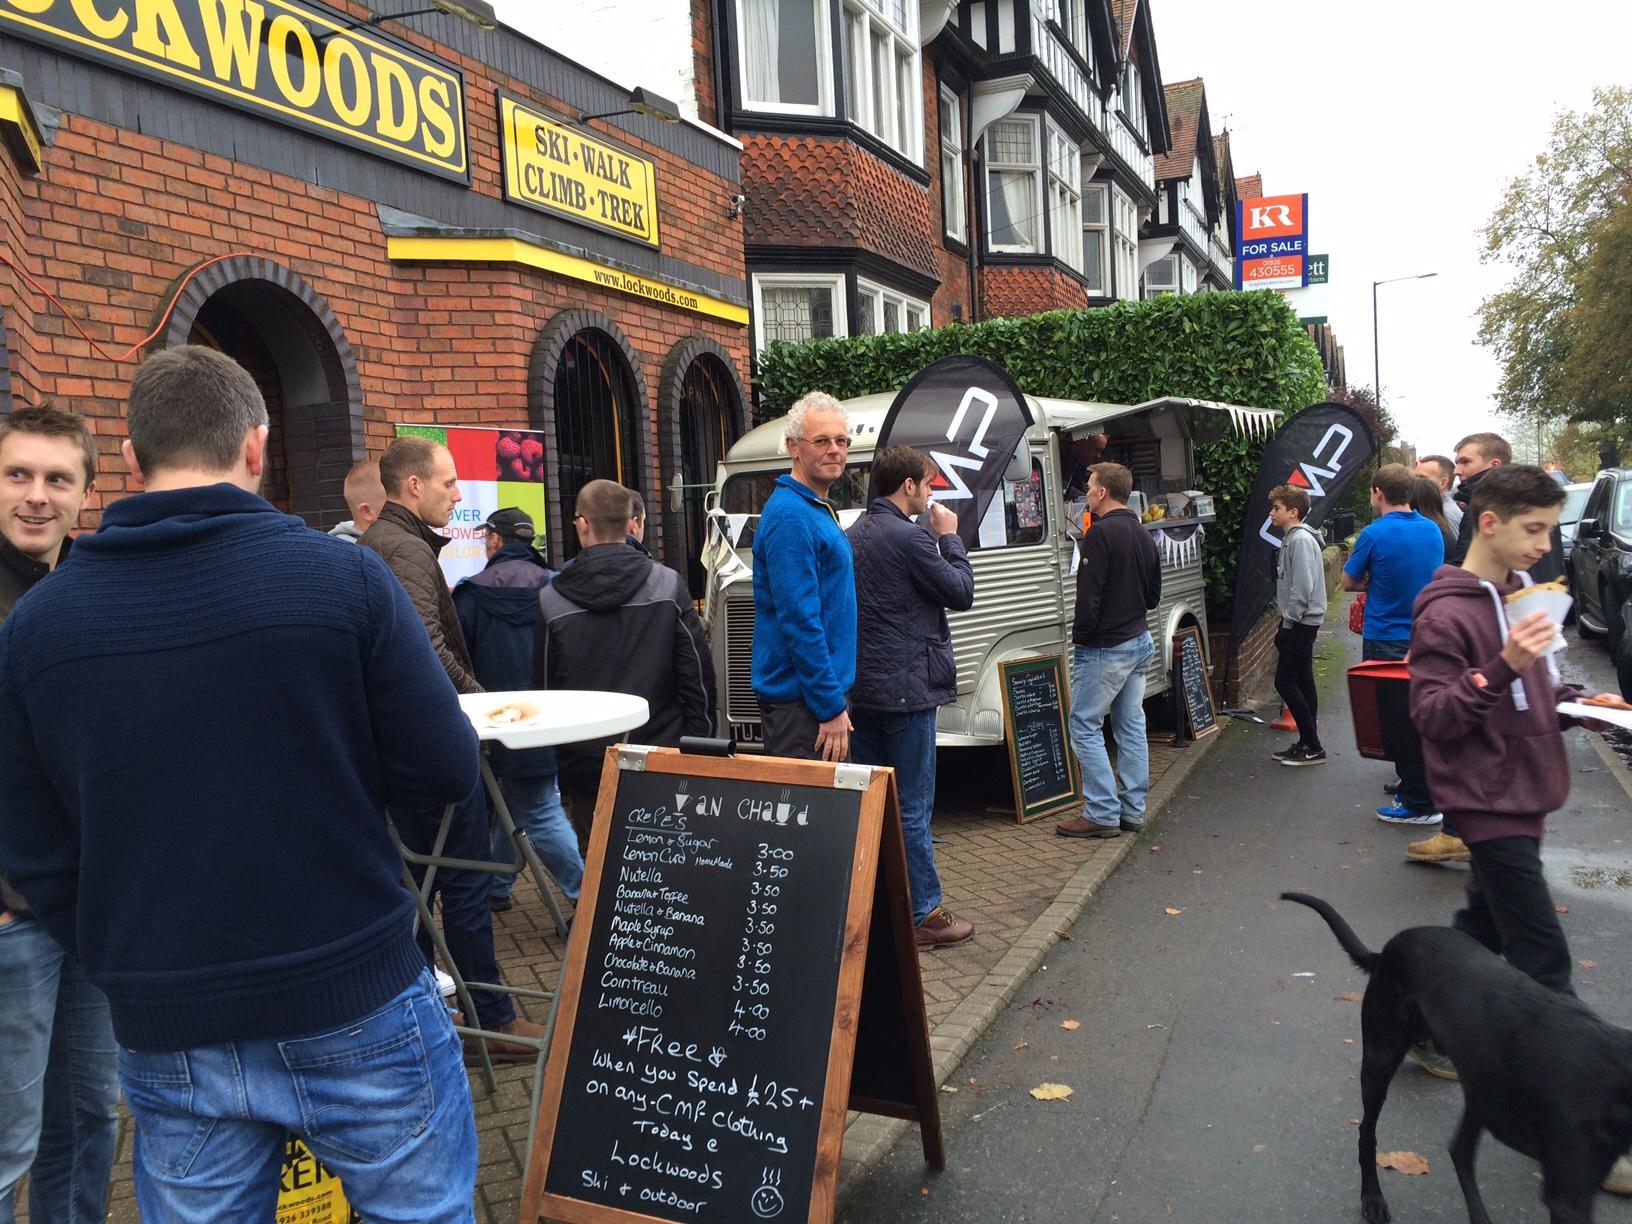 Lockwoods Ski & Outdoor Leamington Spa Brand Promo day